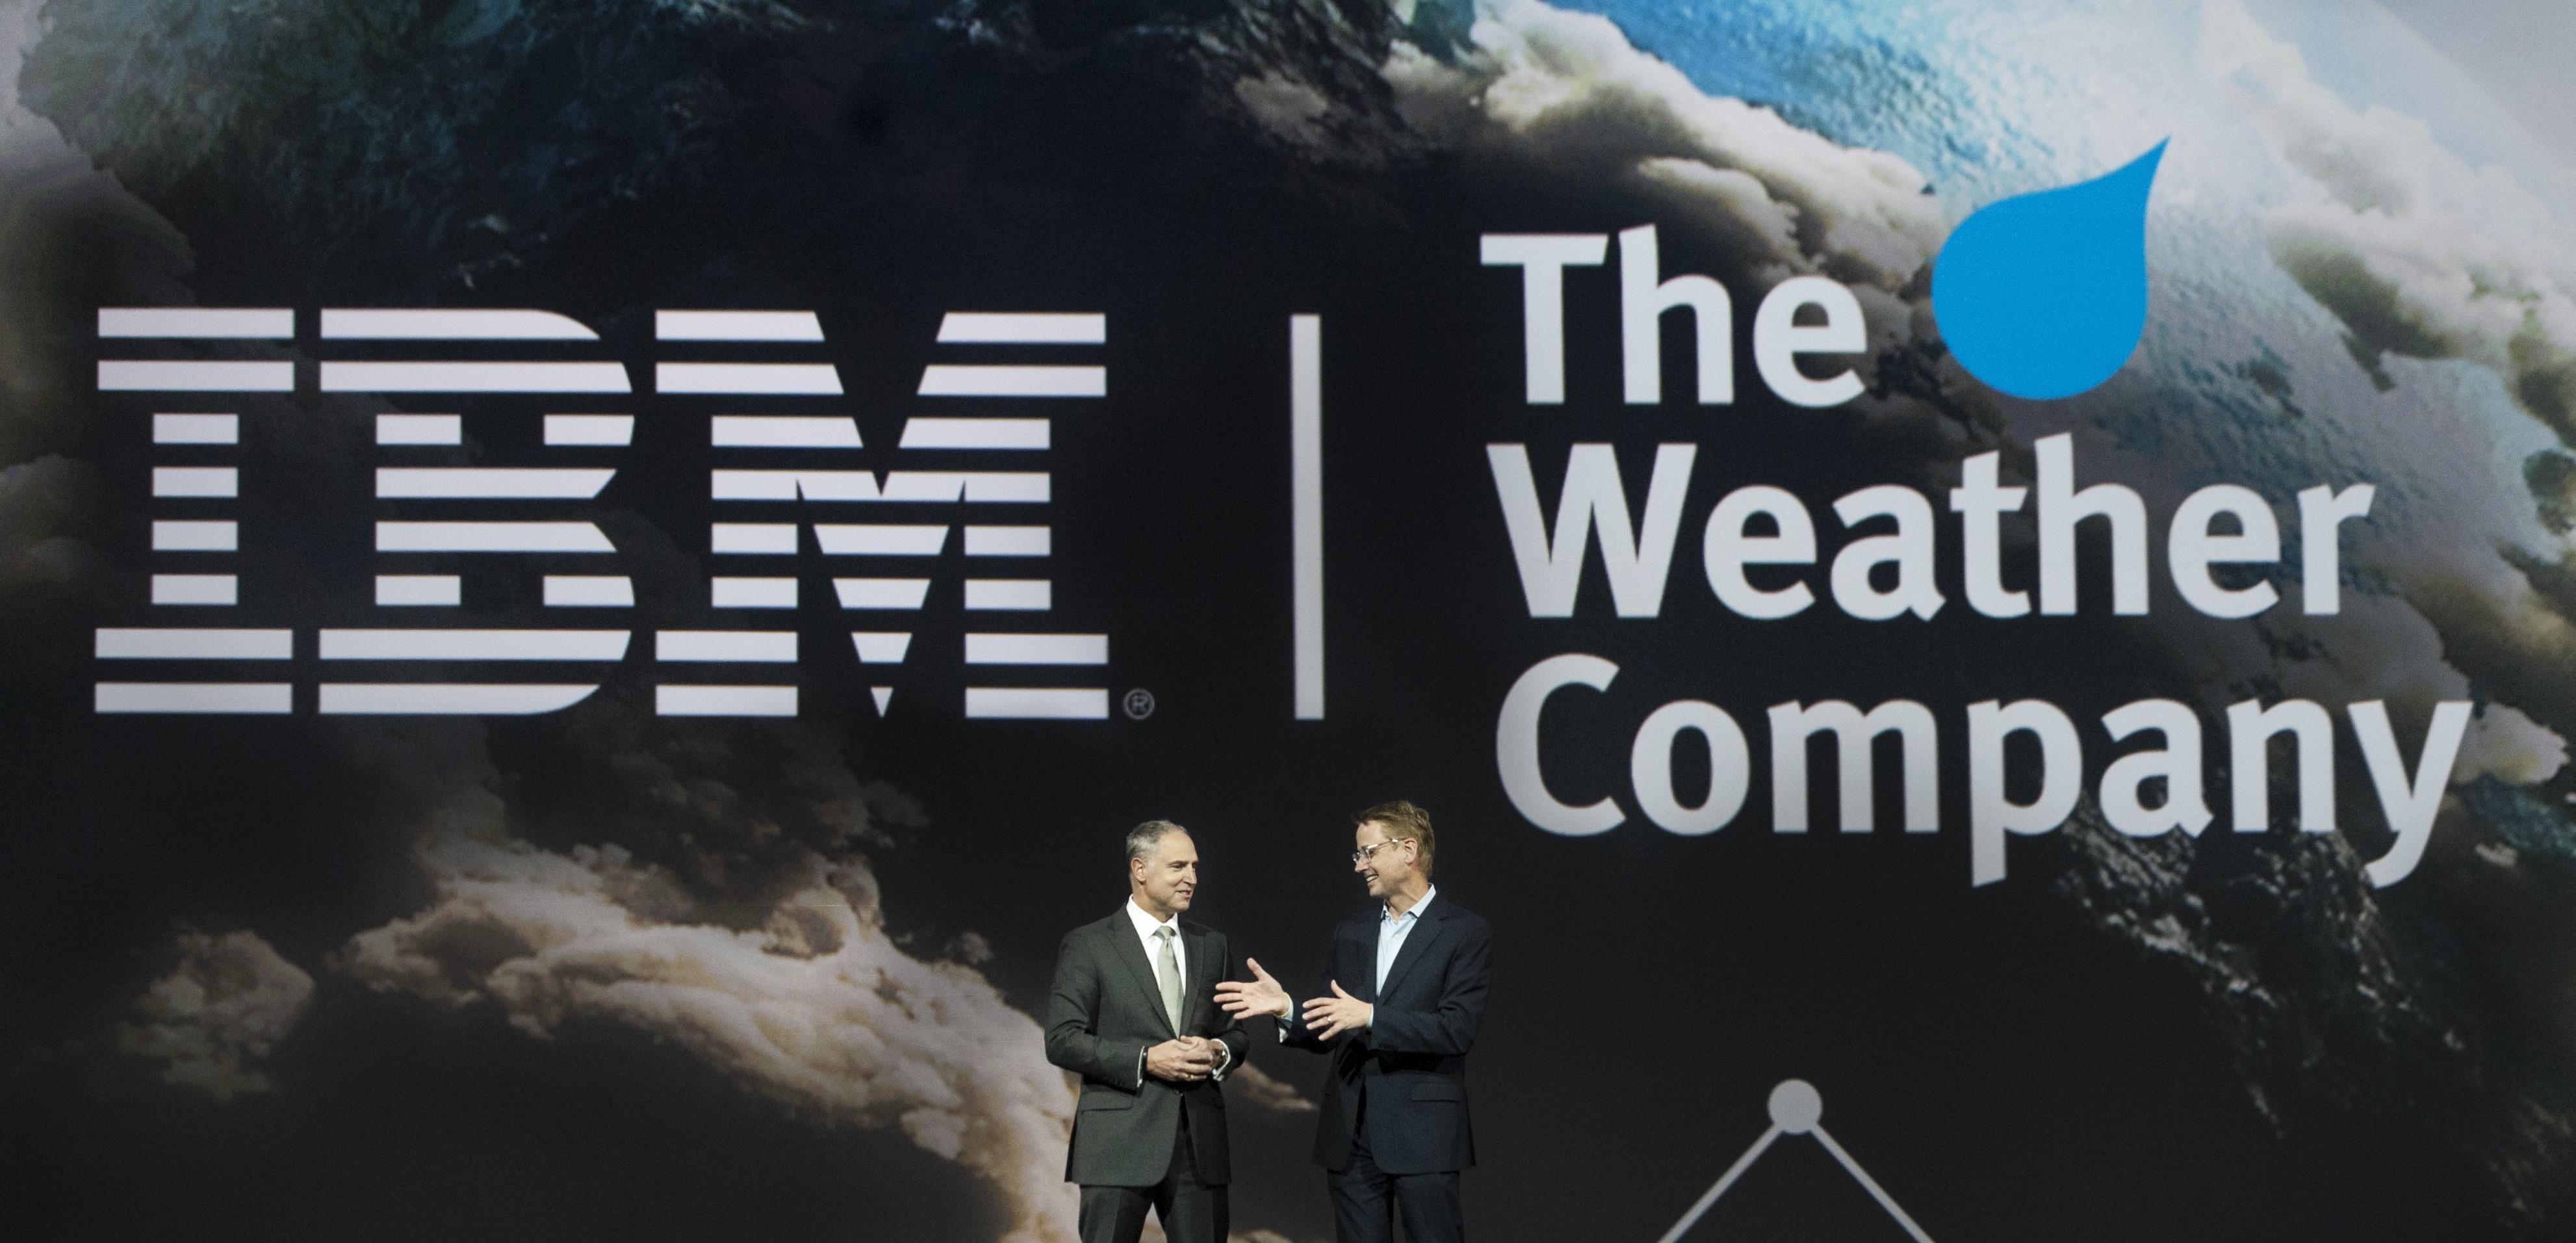 IBM The Weather Company Photo